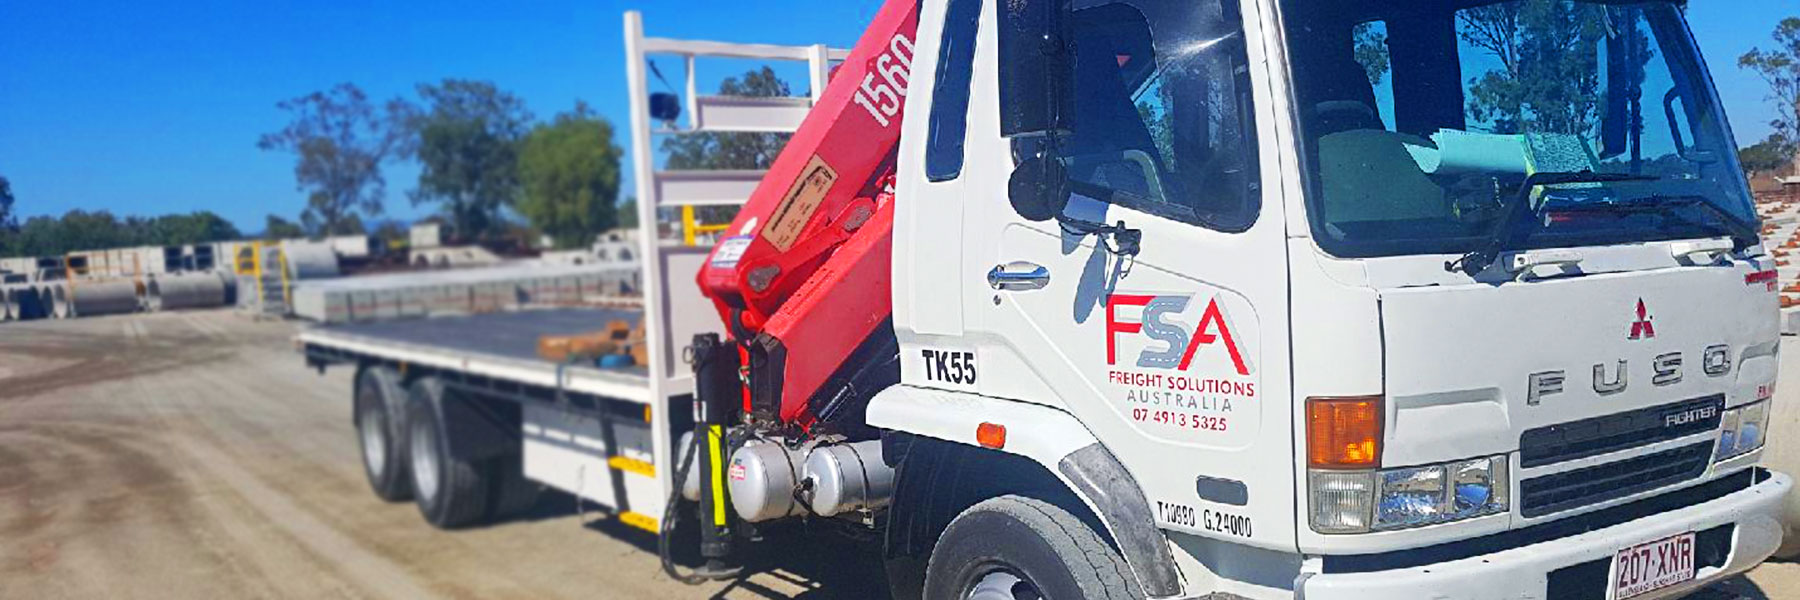 Freight Solution Australia crane truck 3.jpg